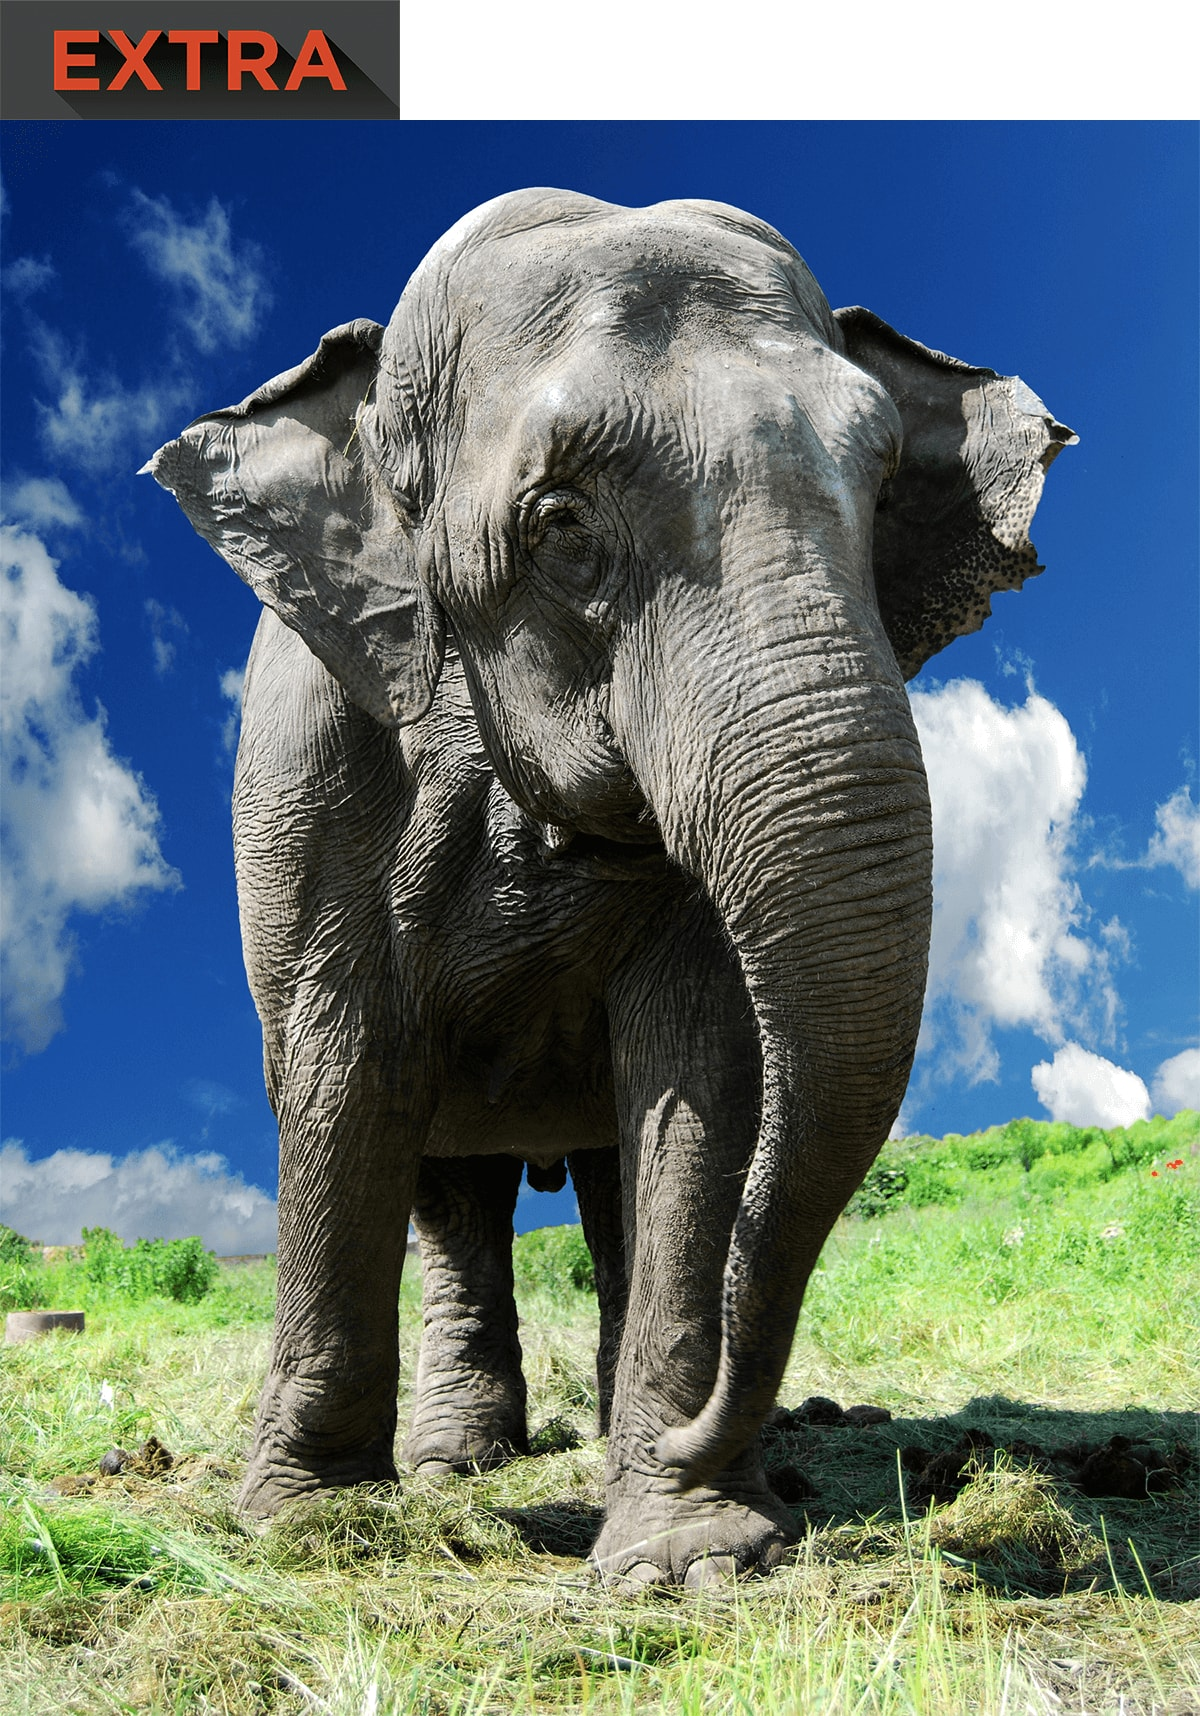 A large elephant.